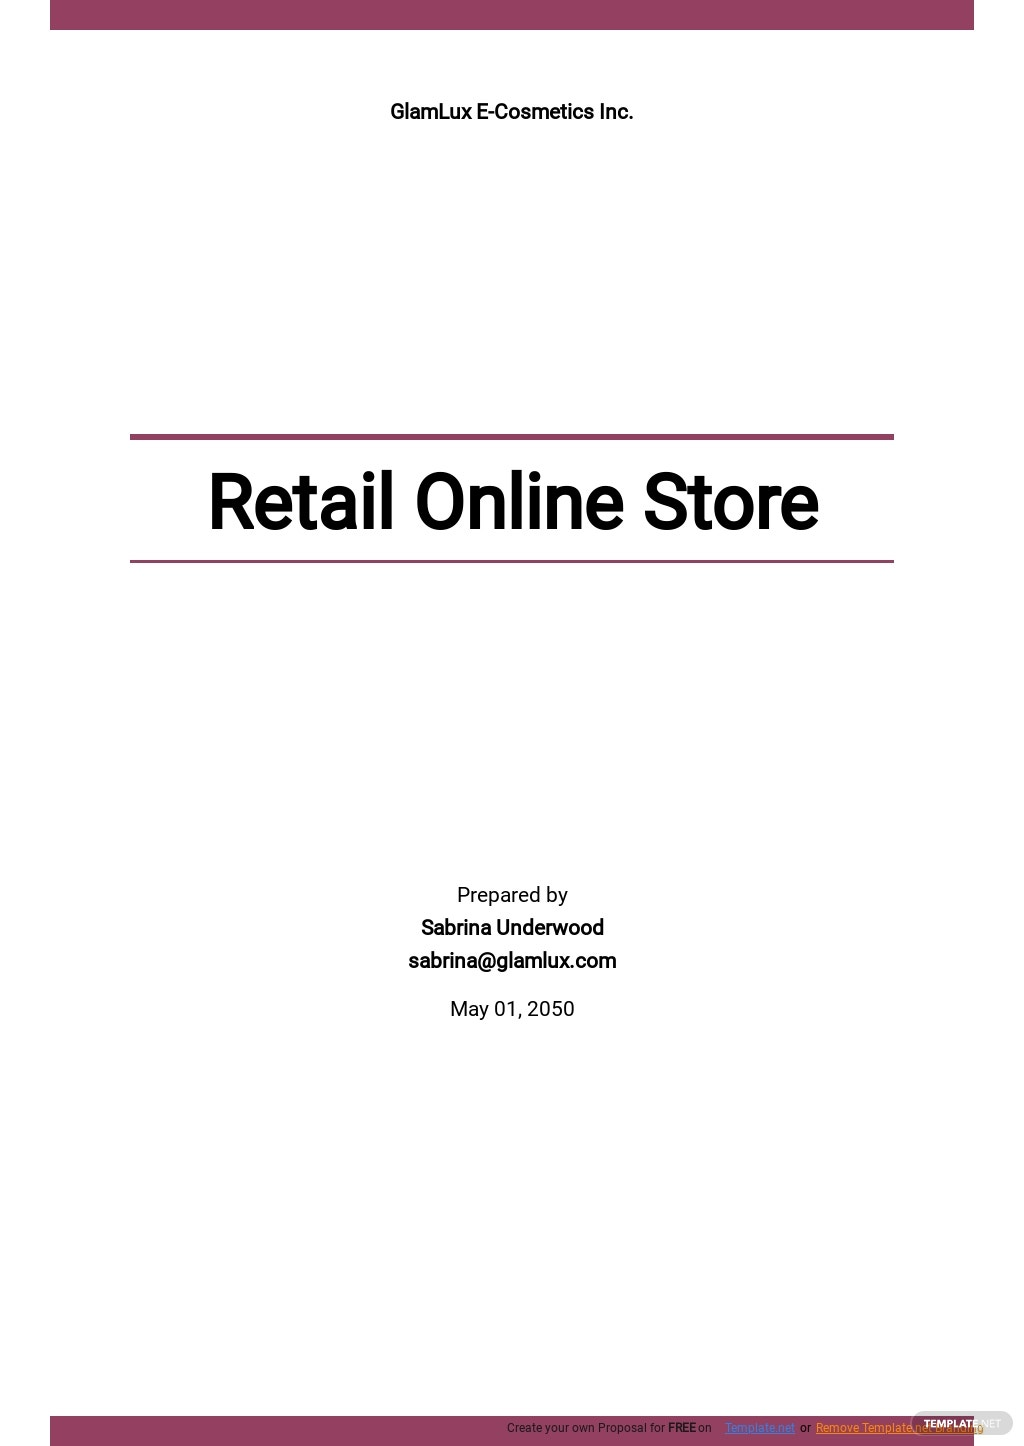 Retail Online Store Business Plan Template.jpe